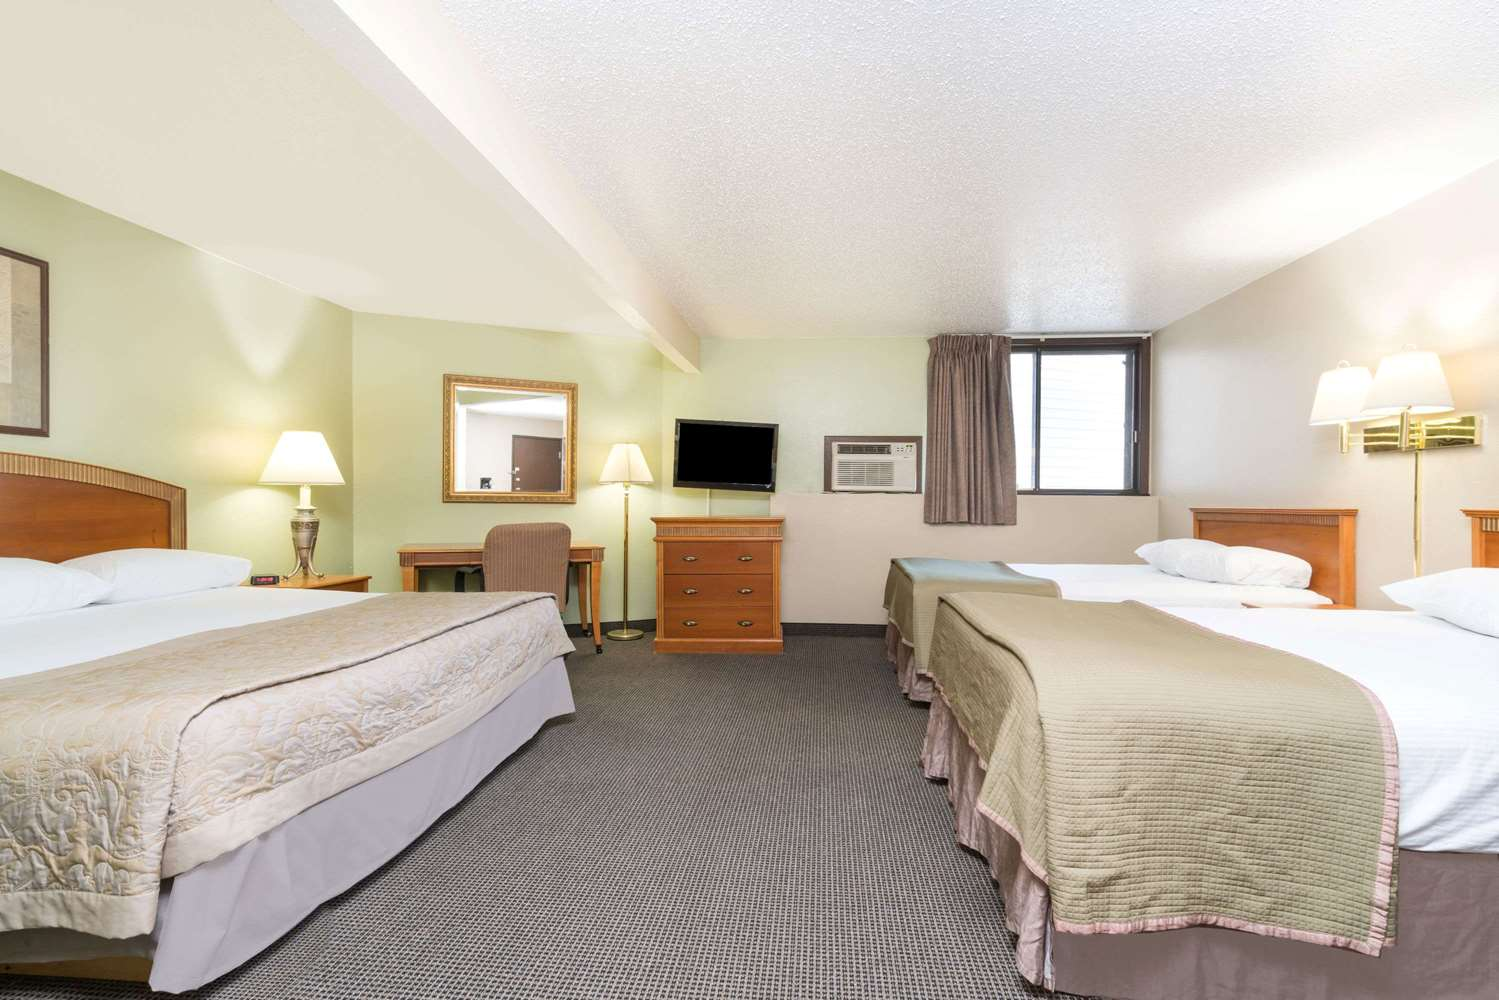 Room - Super 8 Hotel I-29 West Acres Mall Fargo